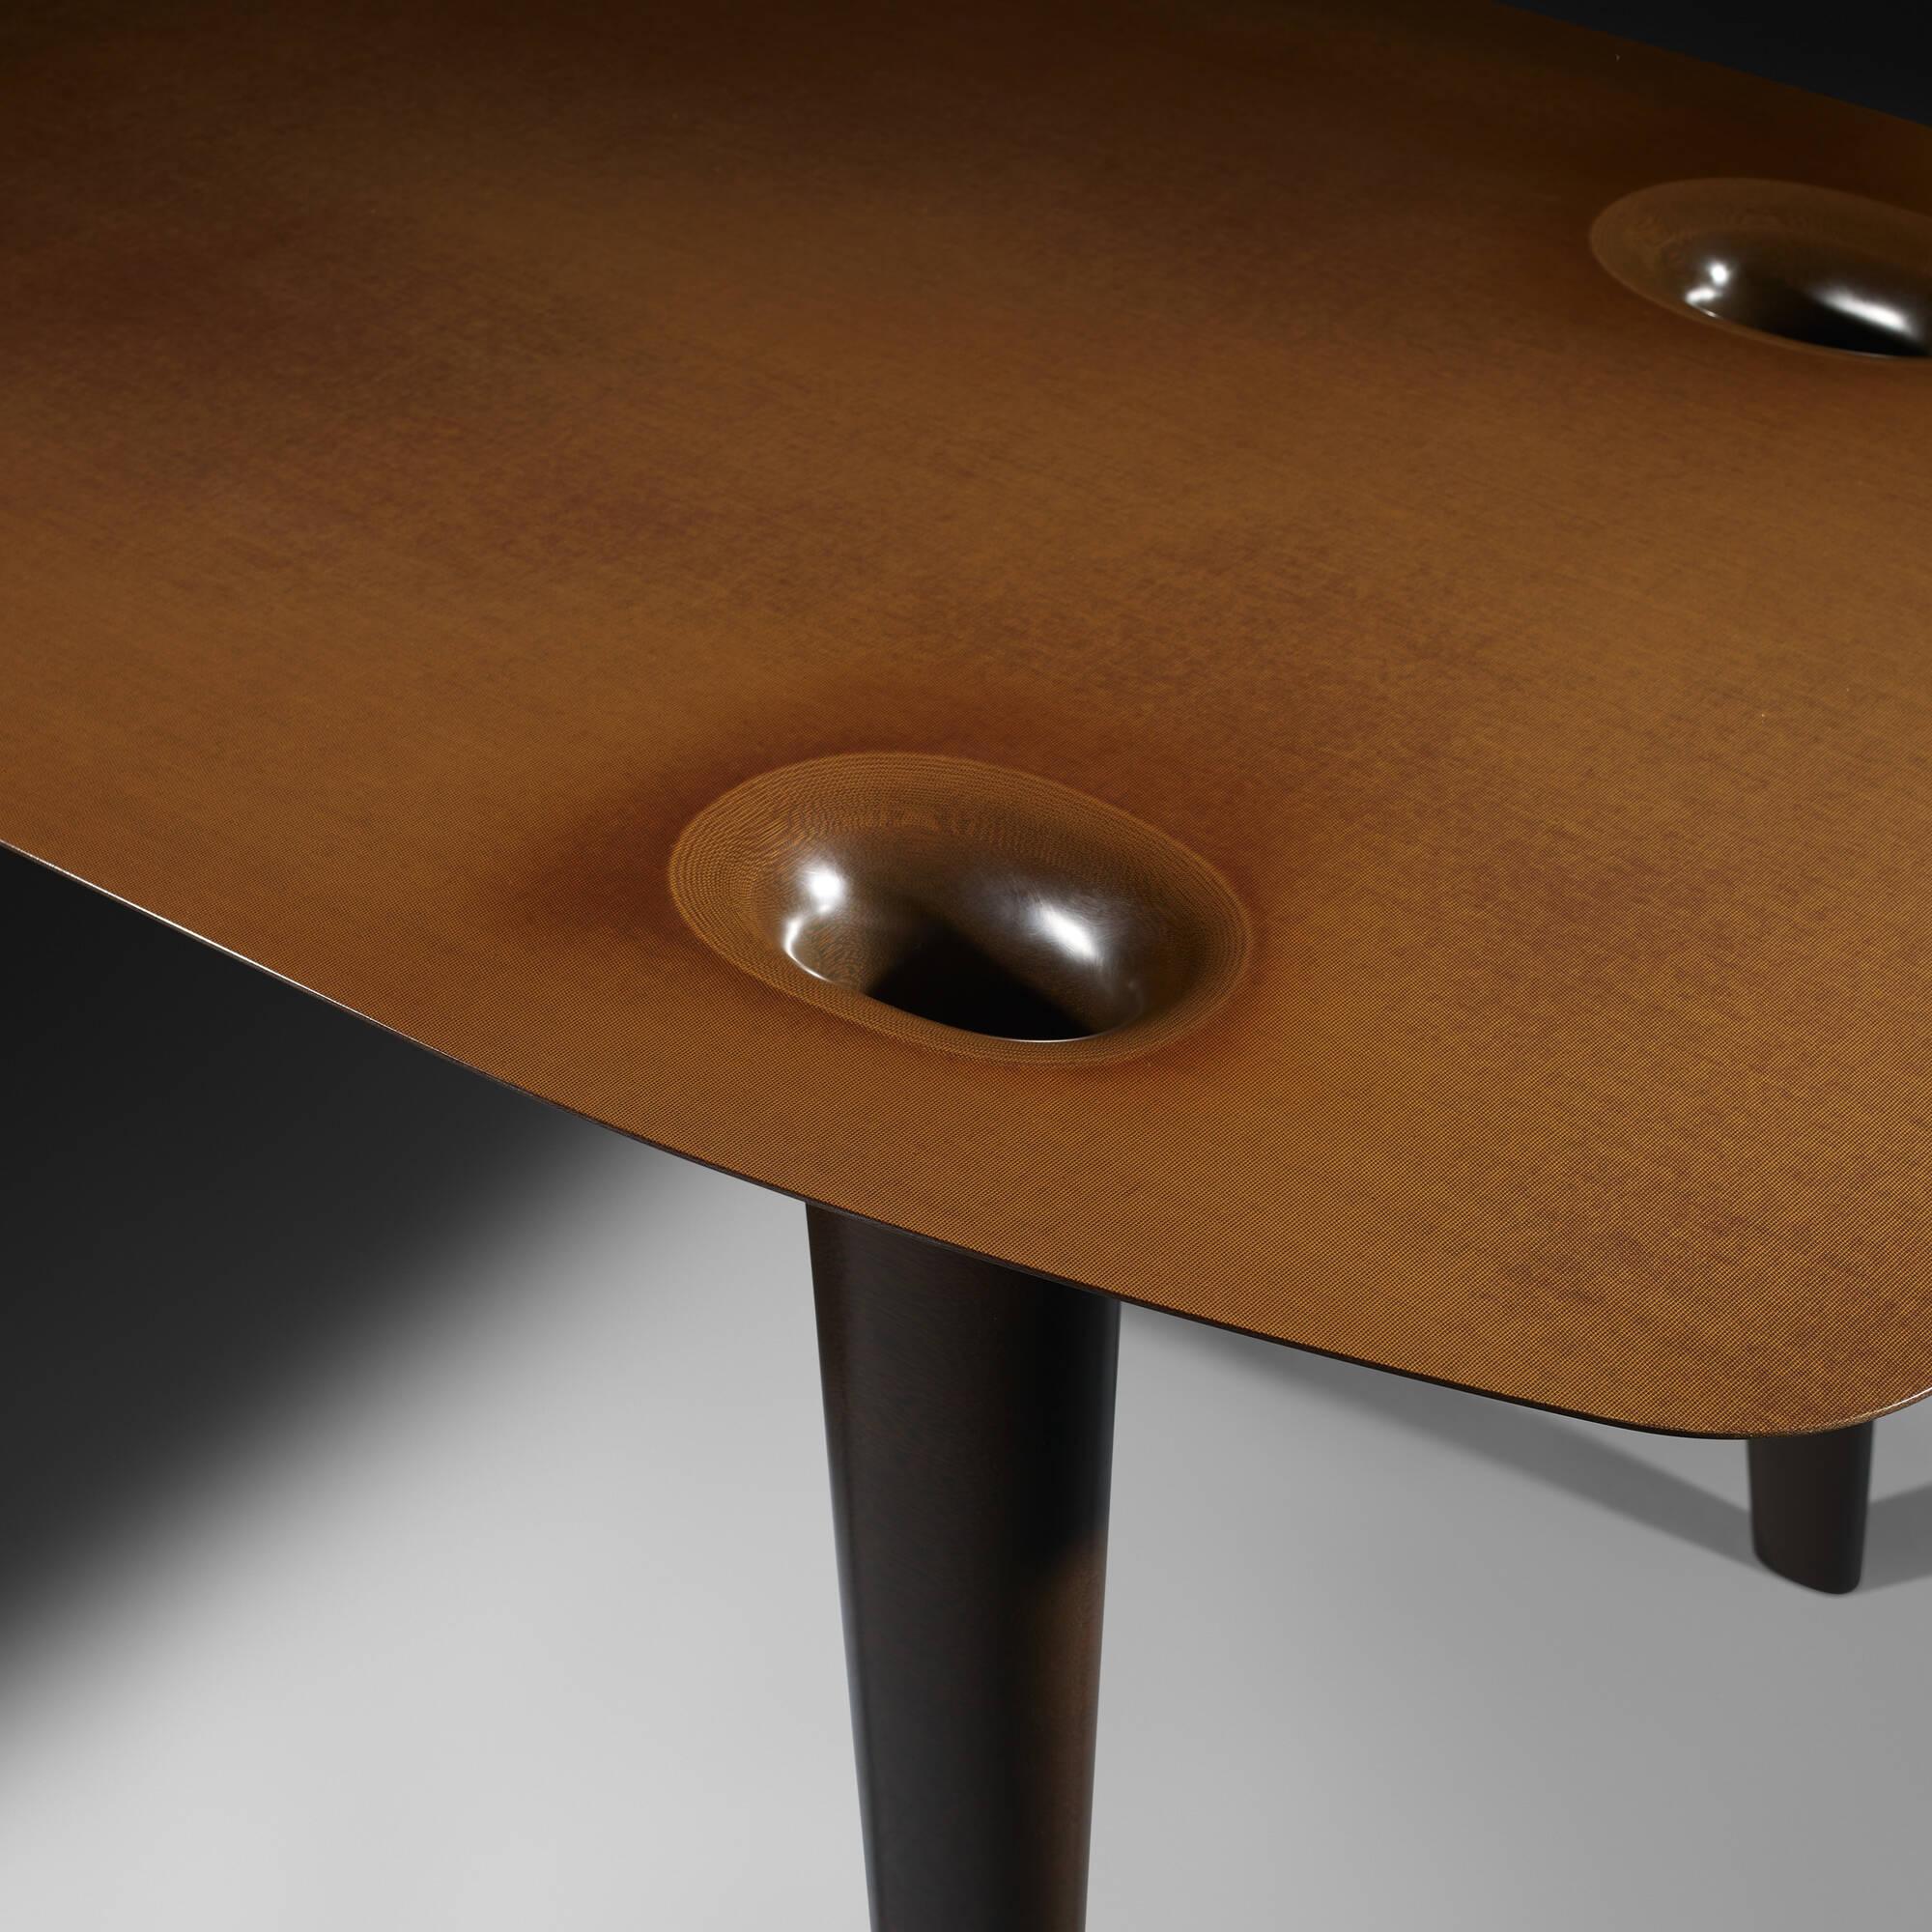 254: MARC NEWSON, Micarta table < Design, 10 December 2015